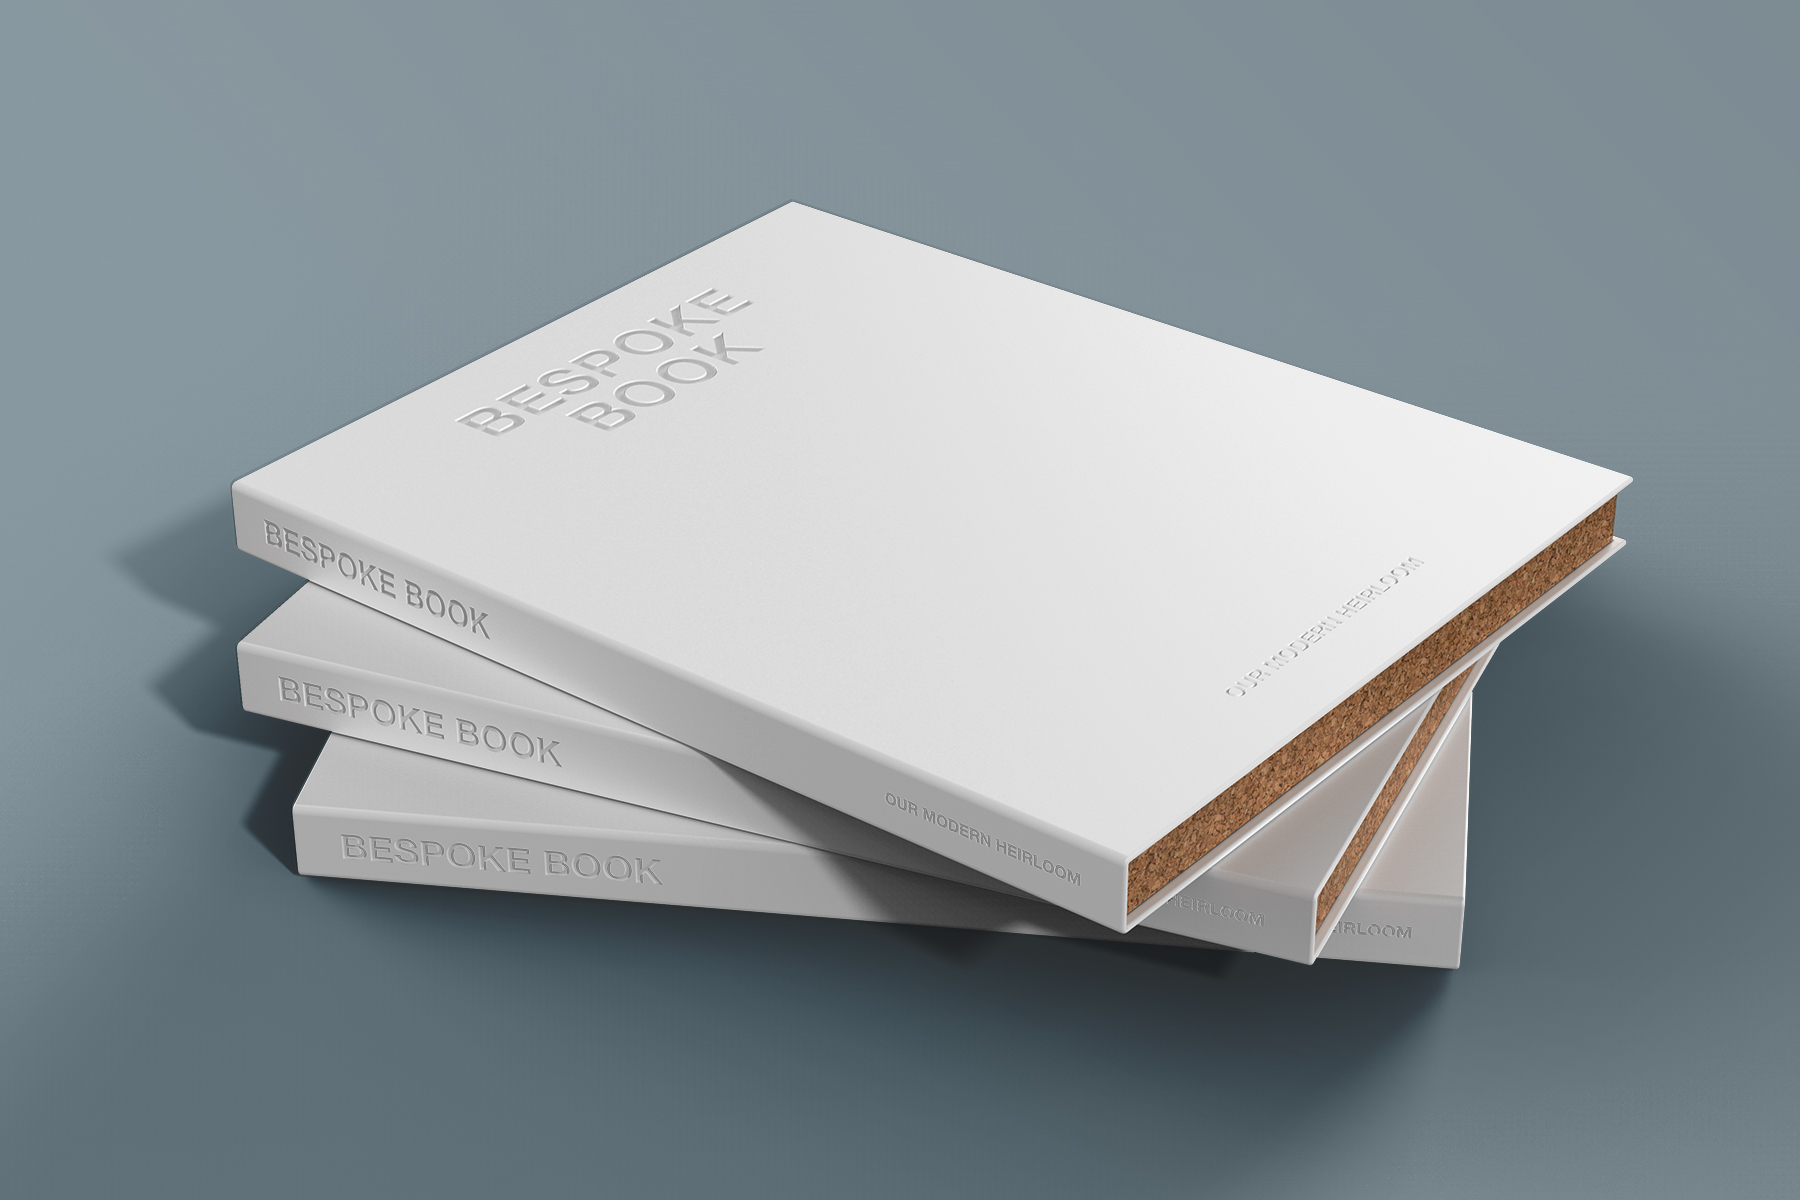 vve.design Creates a Multi-Purpose Rigid Book Packaging